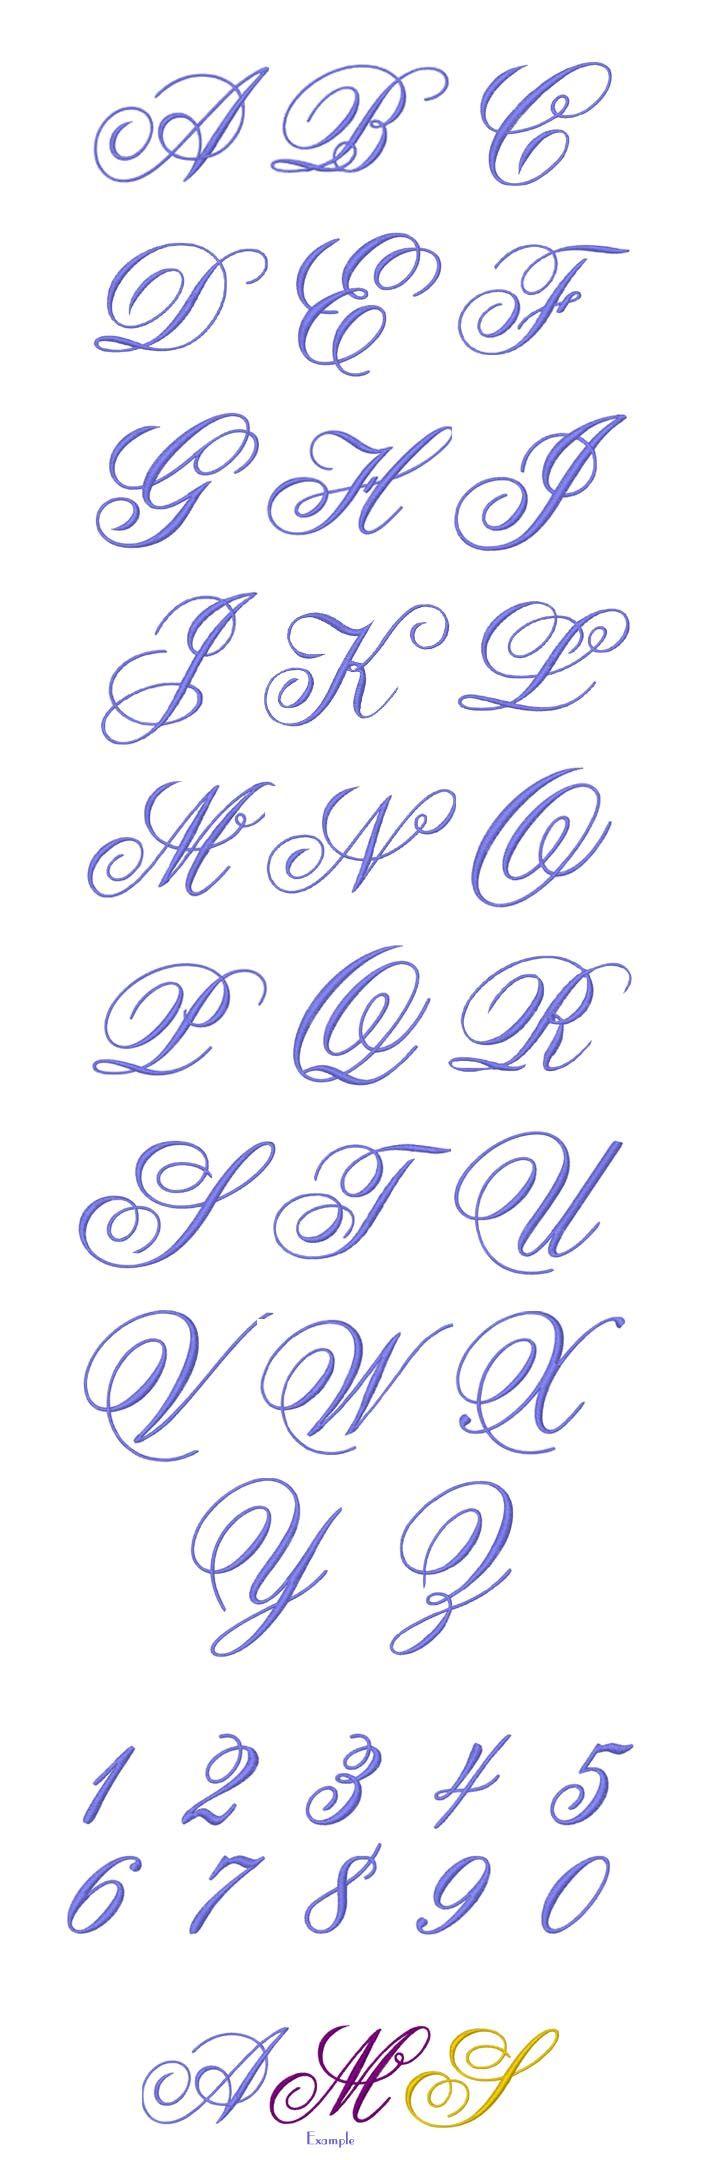 Monogram embroidery designs free design